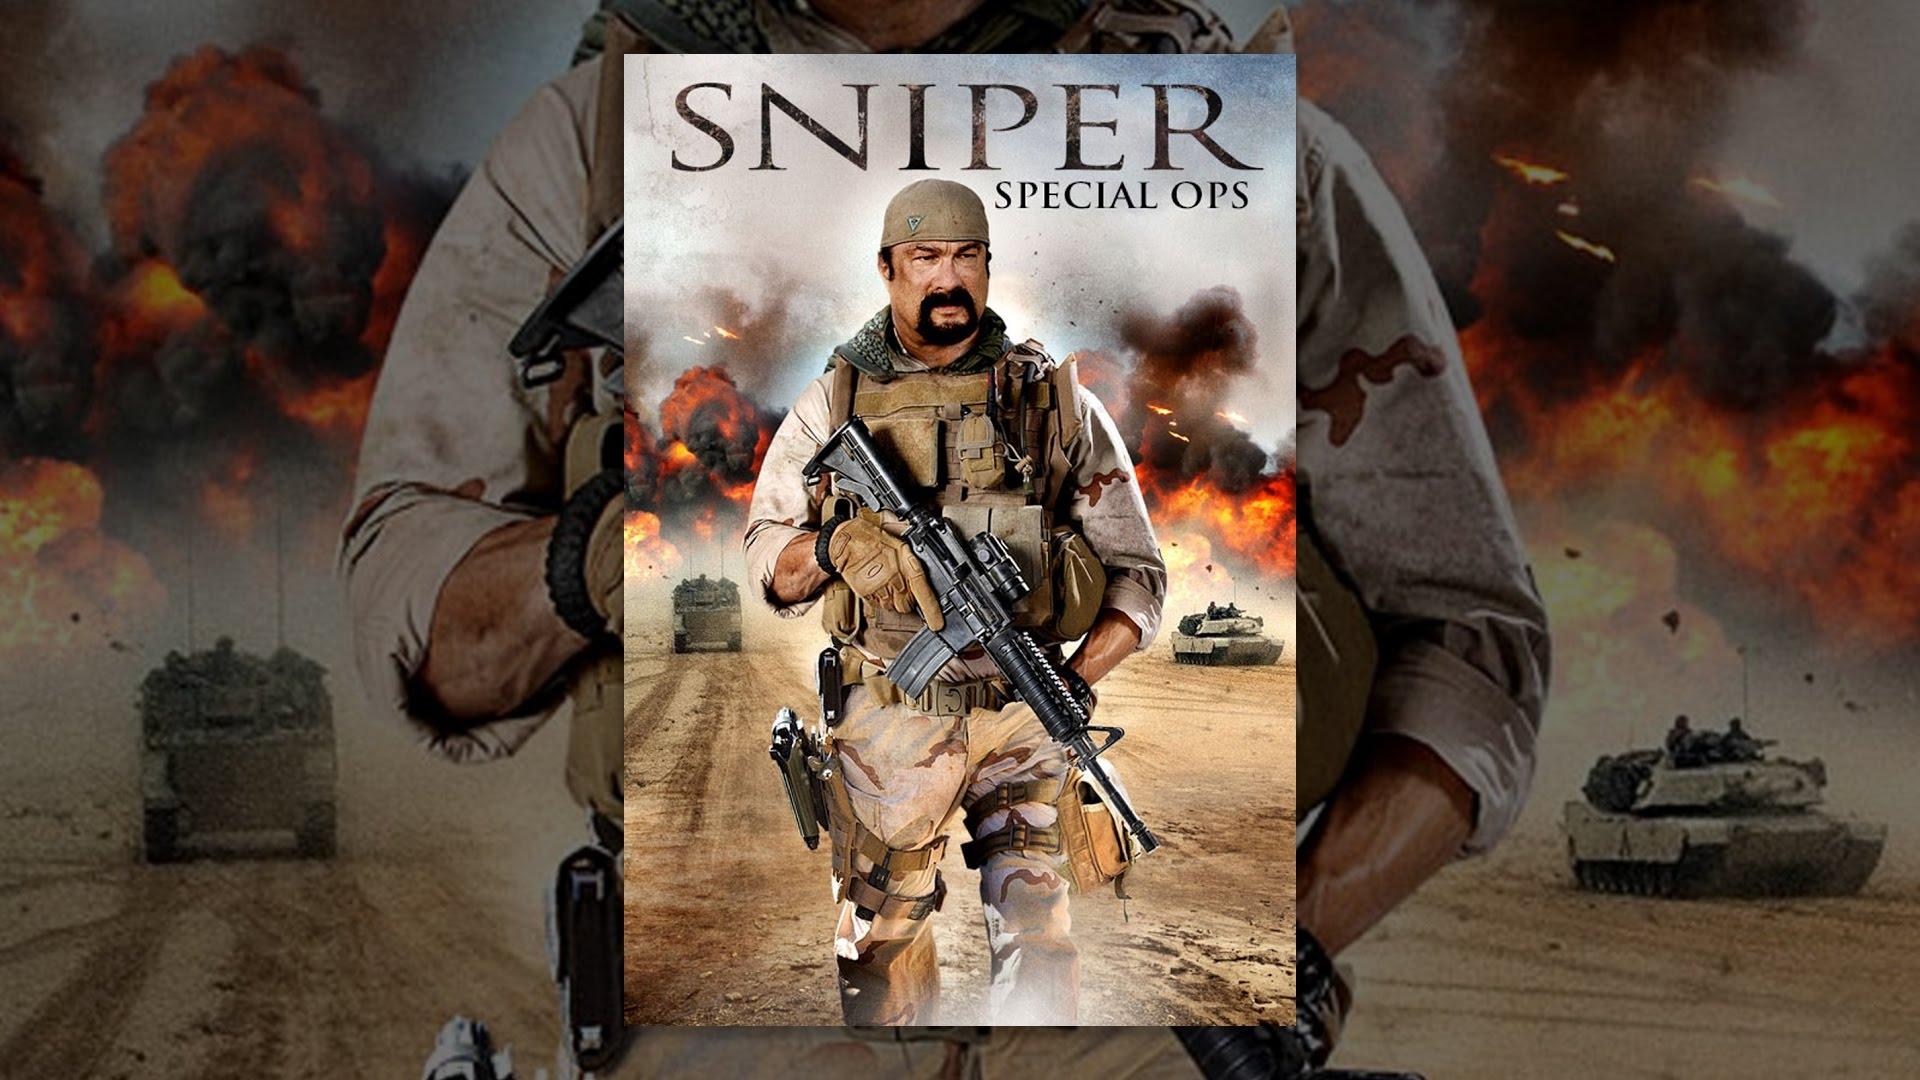 Sniper – Special Ops